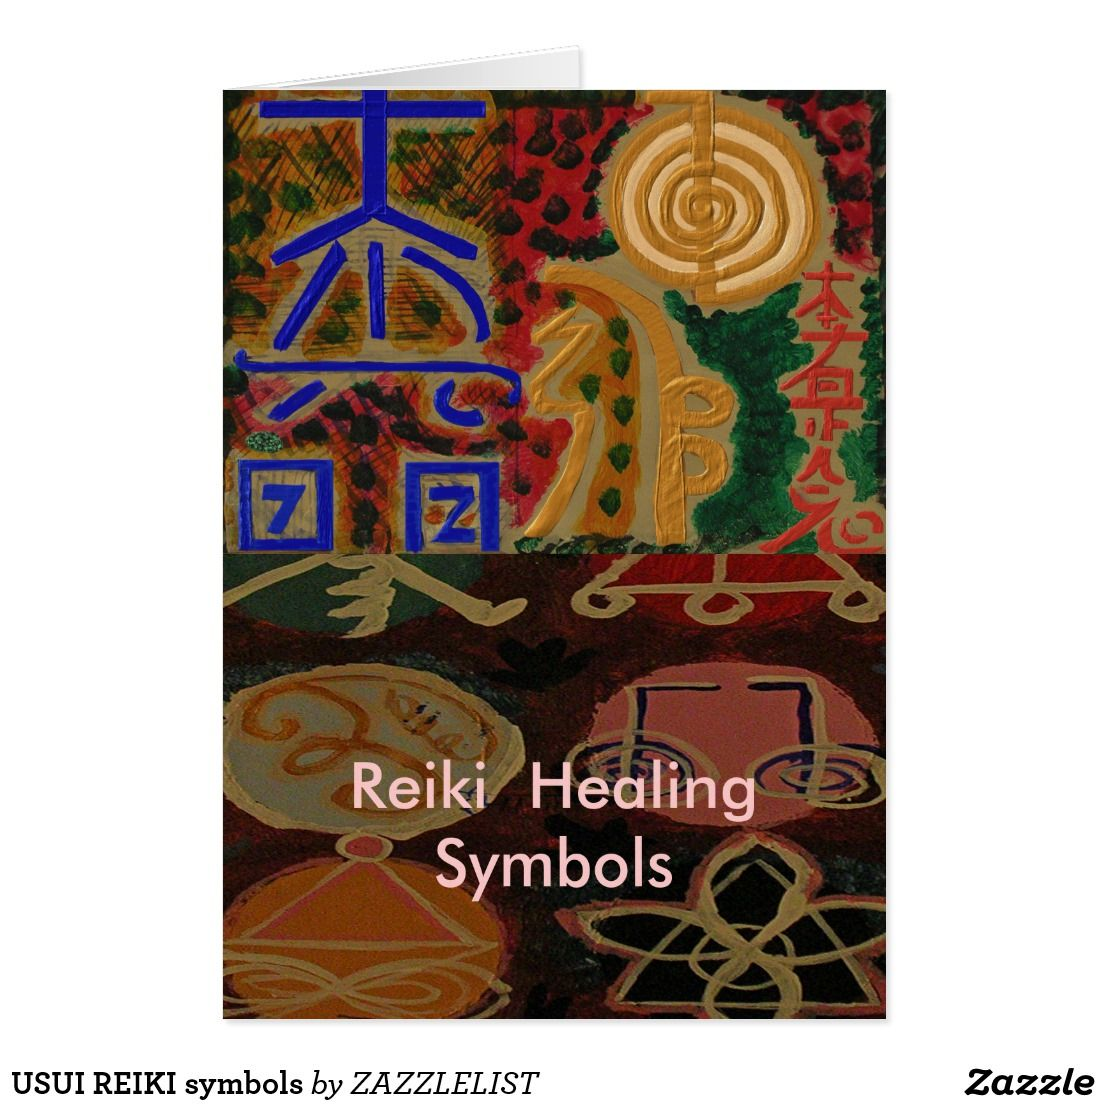 Usui reiki symbols card 101 zazzle pro favorite stores usui reiki symbols card biocorpaavc Image collections